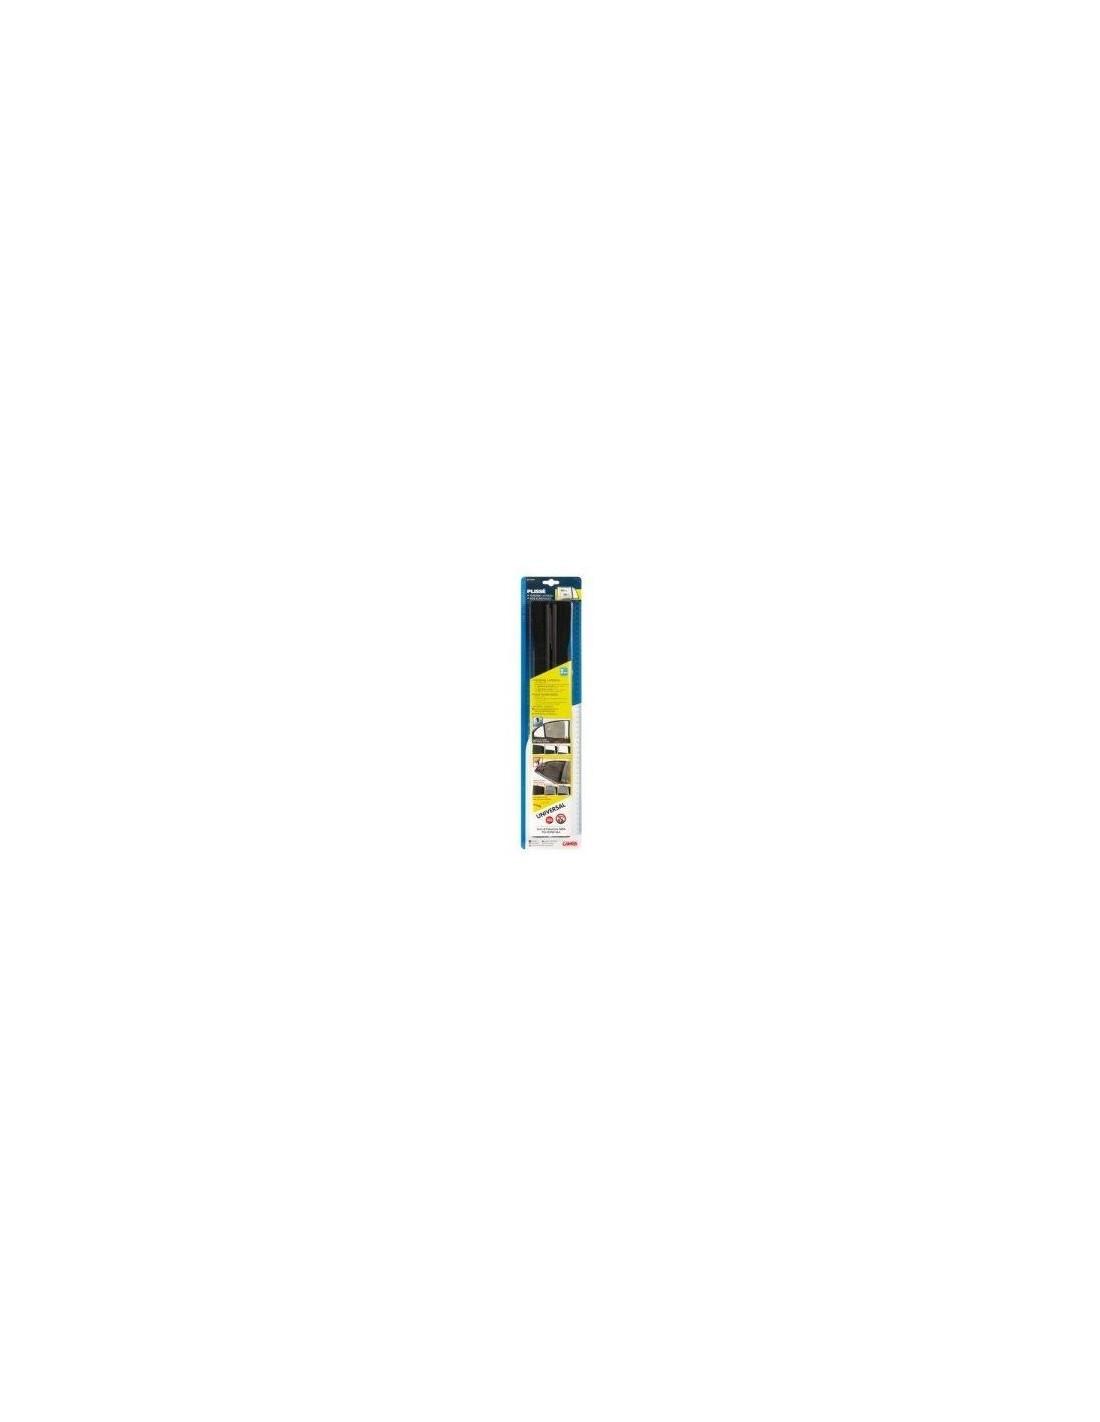 LAMPA 66896 Set 2 Calze-Tendine Laterali-Rettangolare-L